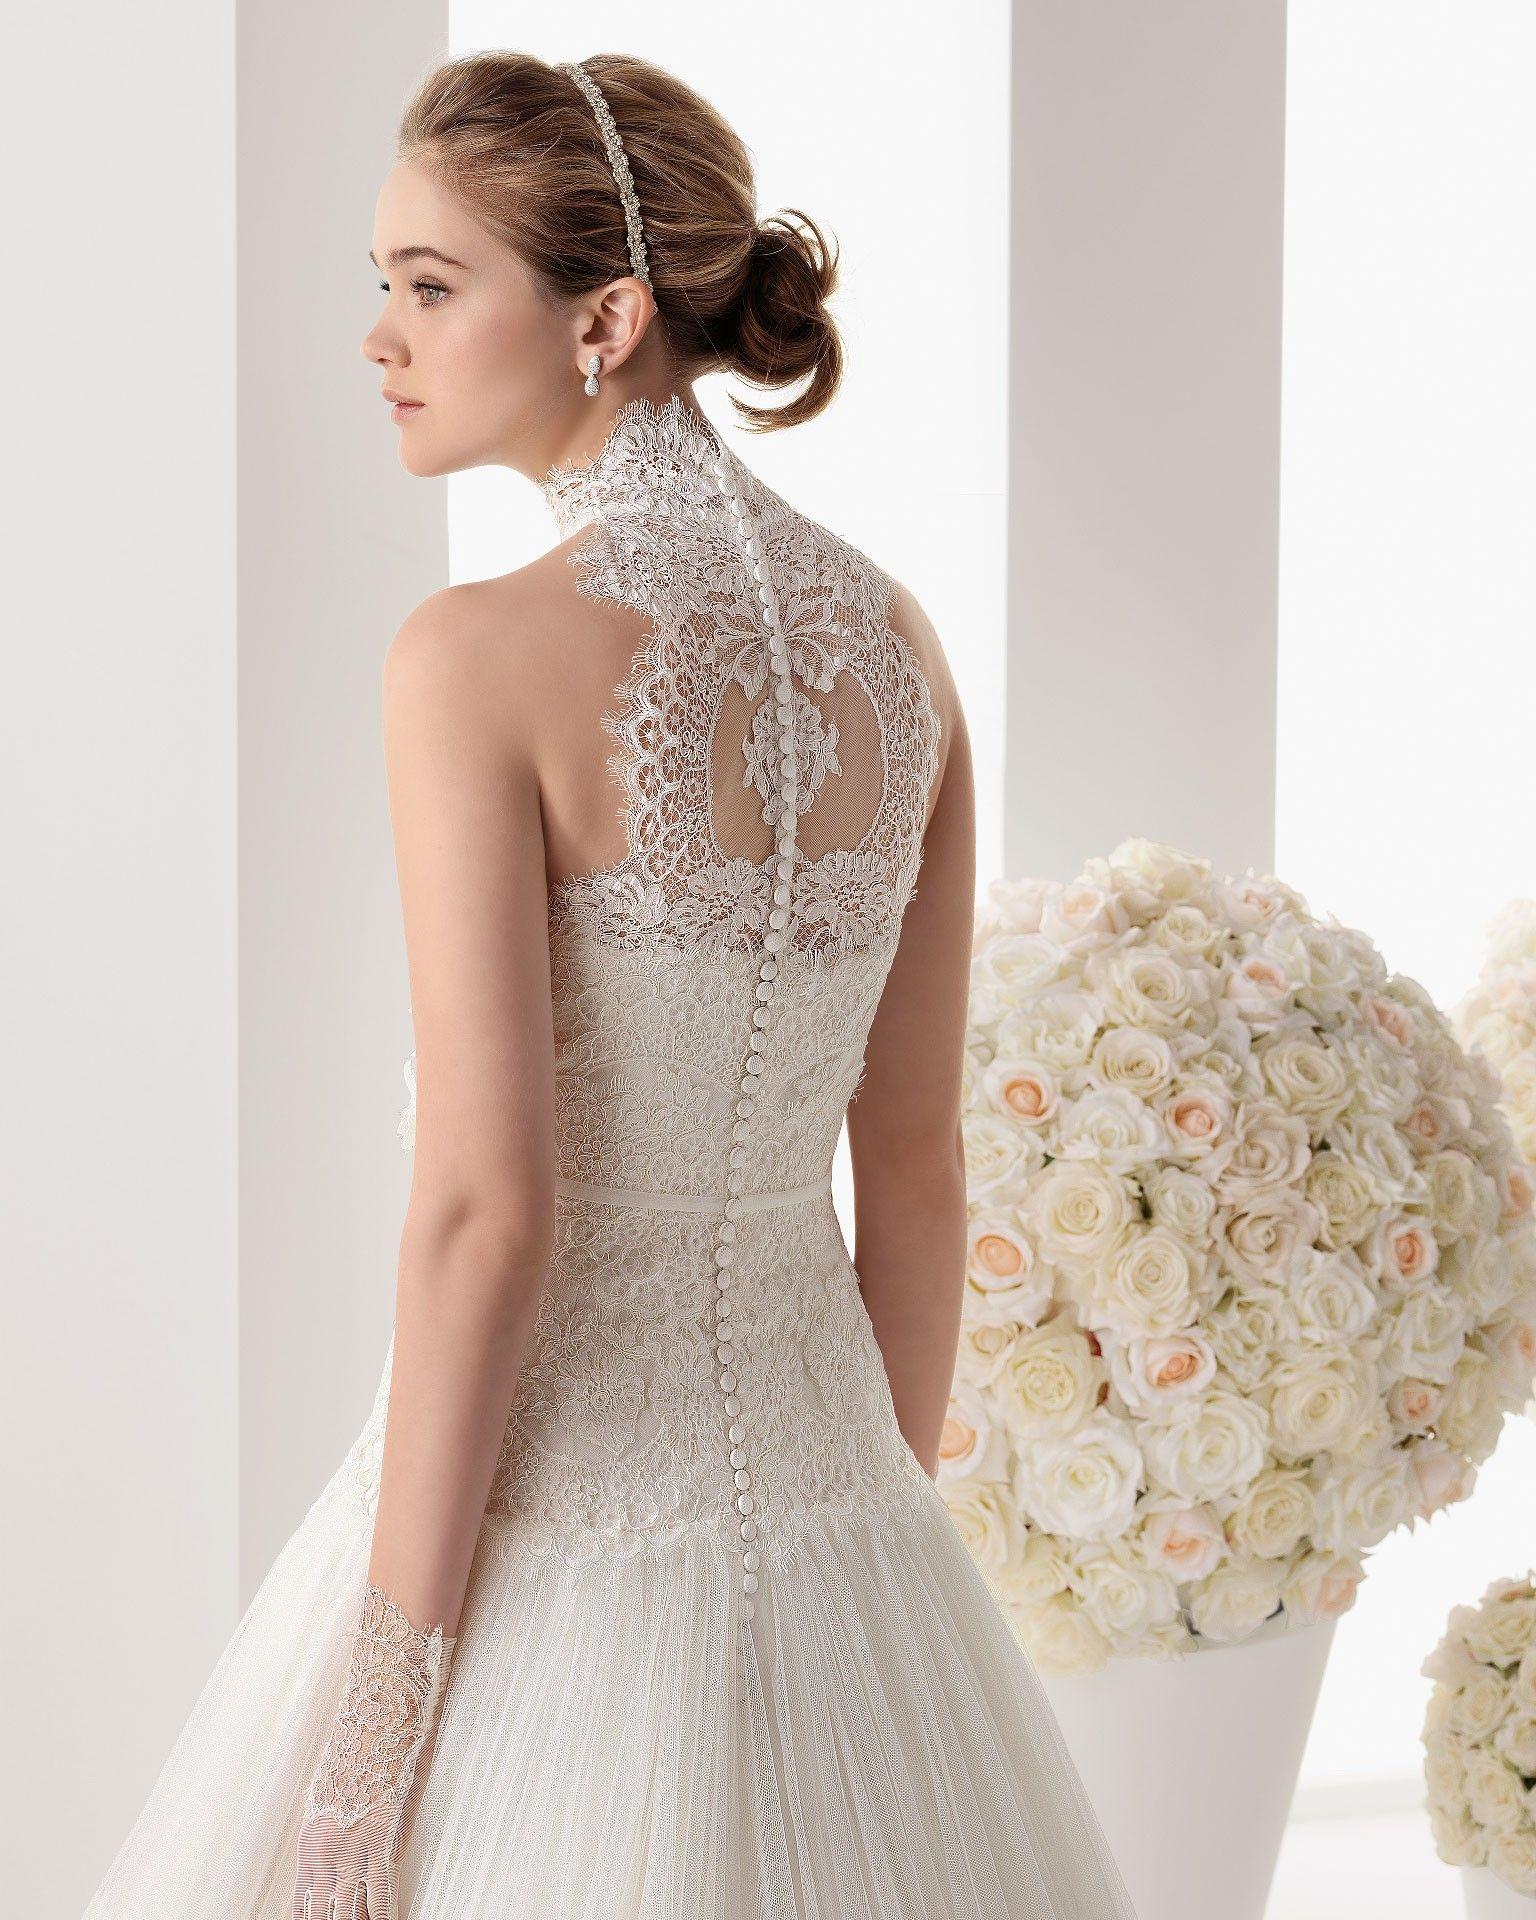 Fashion drop waist high neck tulle ivory sweep train wedding dress